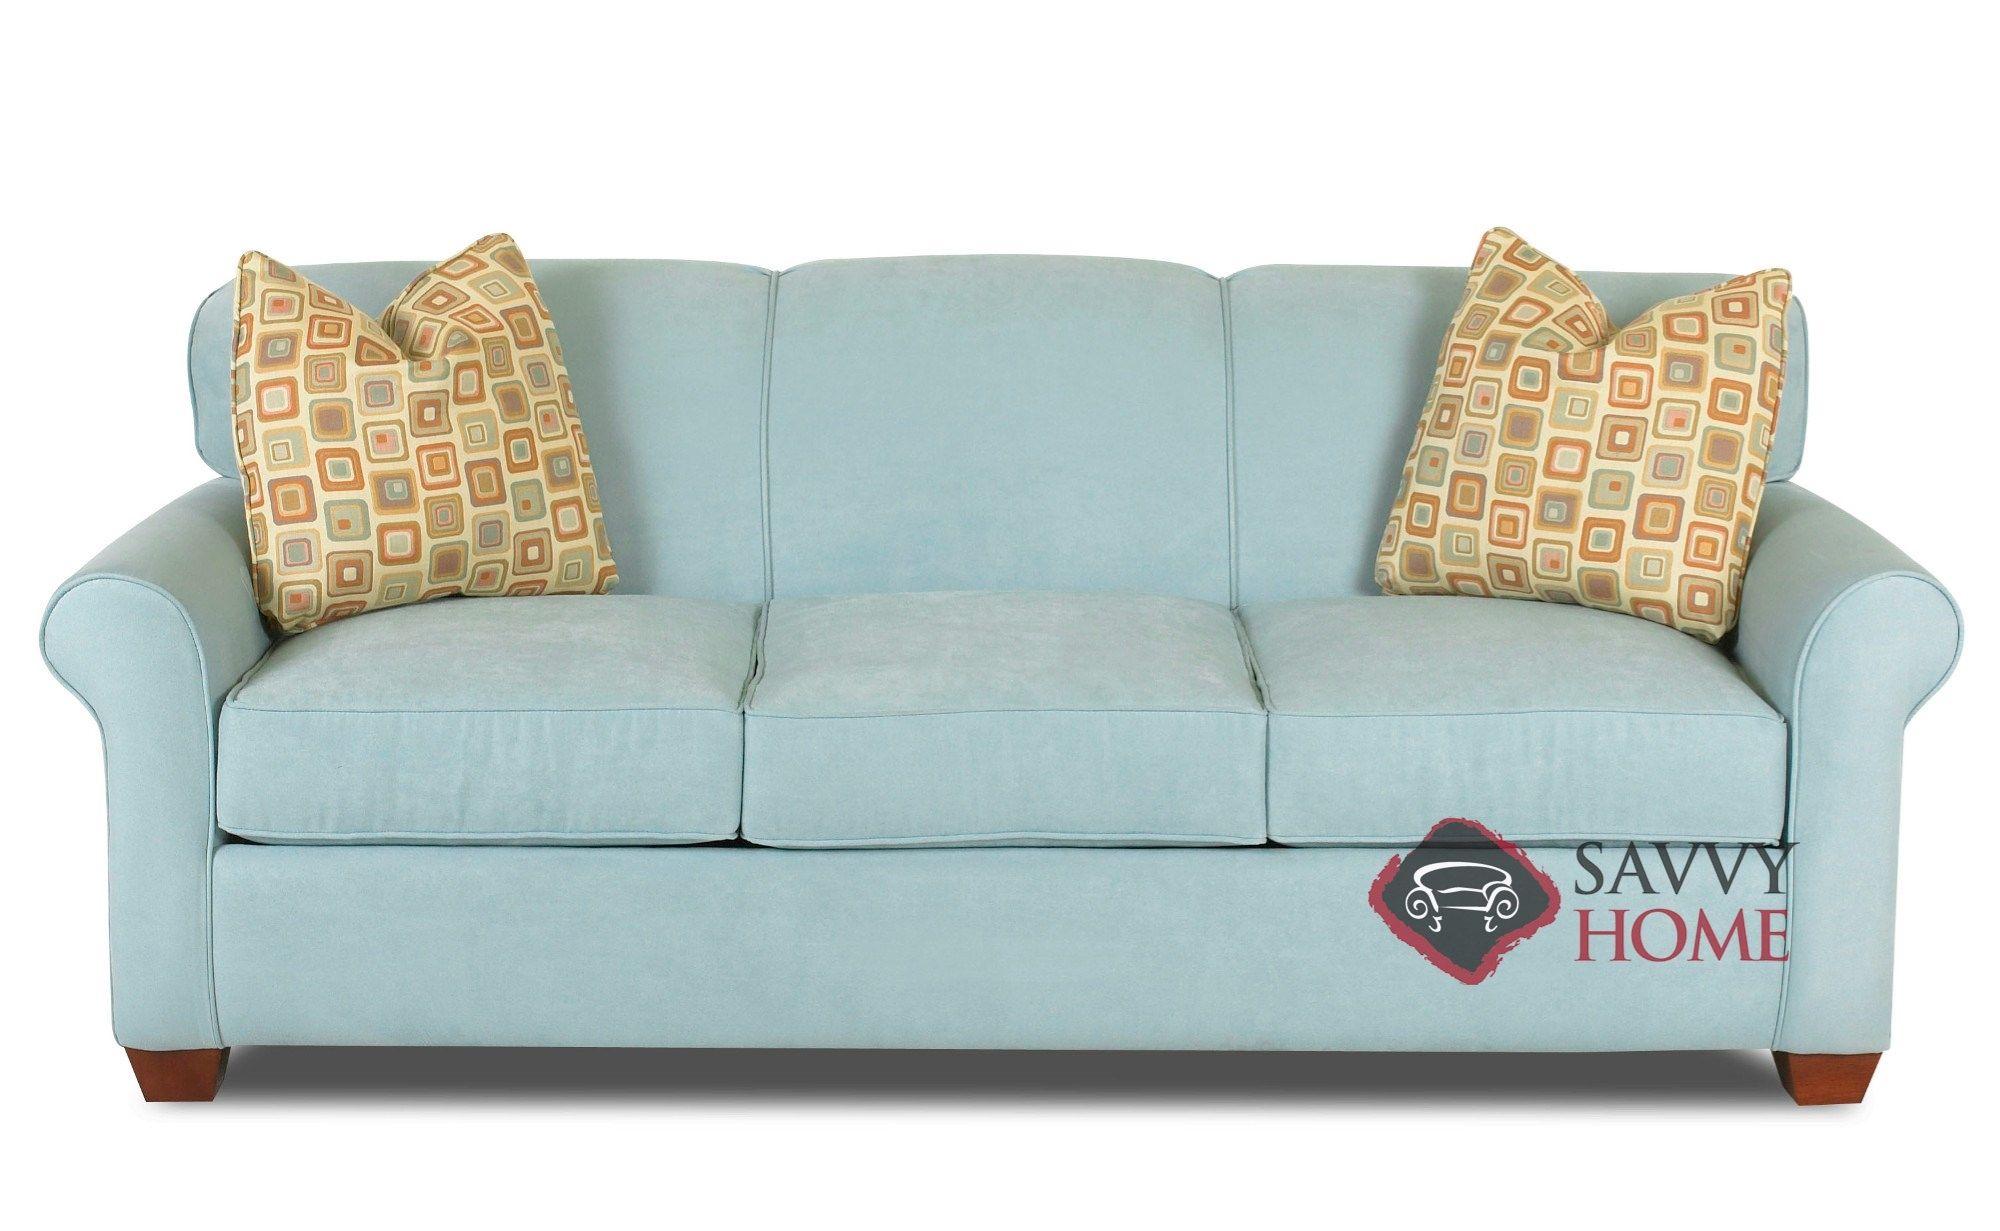 Calgary Queen Sofa Bed By Savvy Sleeper Sofa Queen Size Sofa Bed Sofa